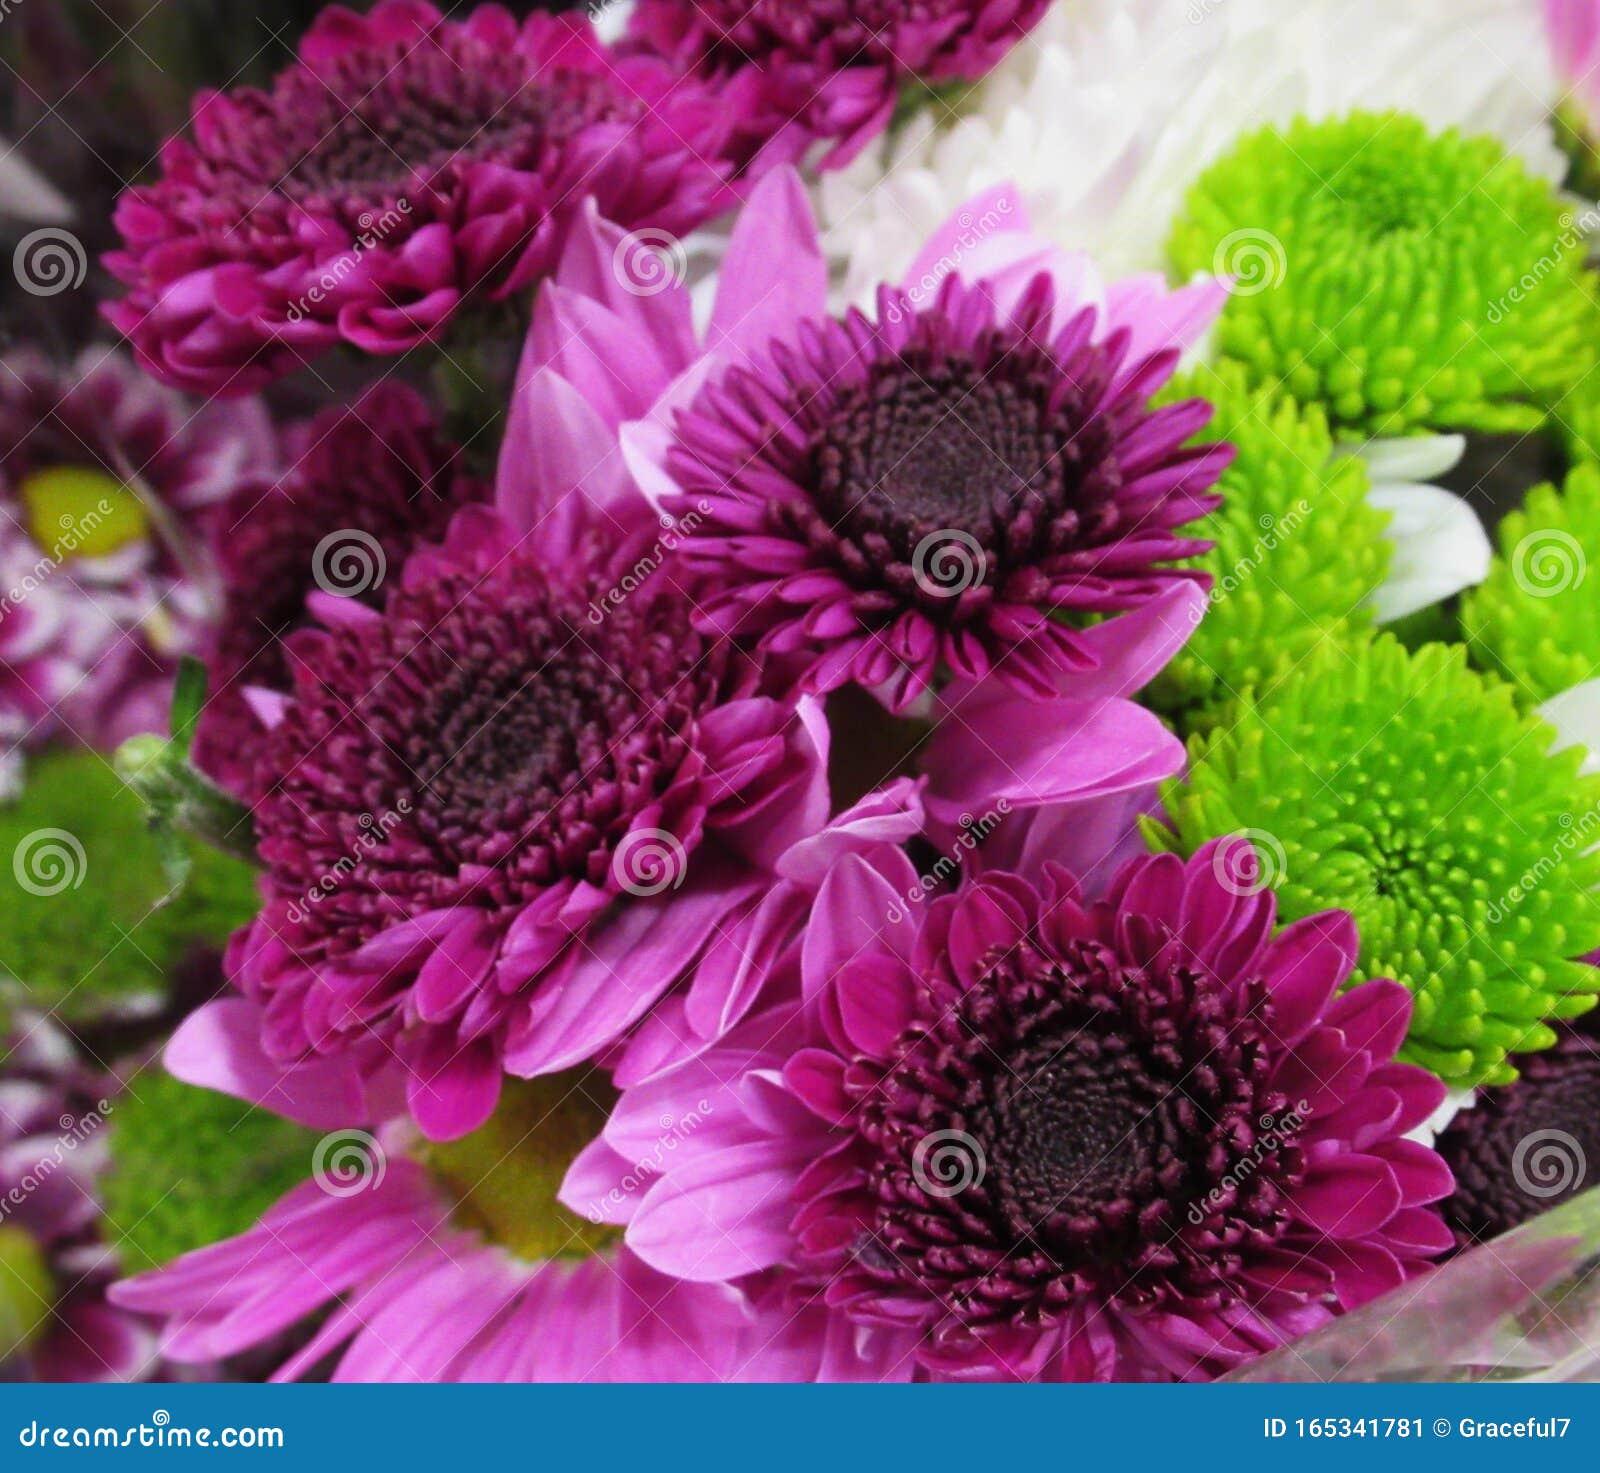 Pretty Fresh Bright Purple Dahlia Flowers Bouquet Stock Image Image Of Bright Shop 165341781